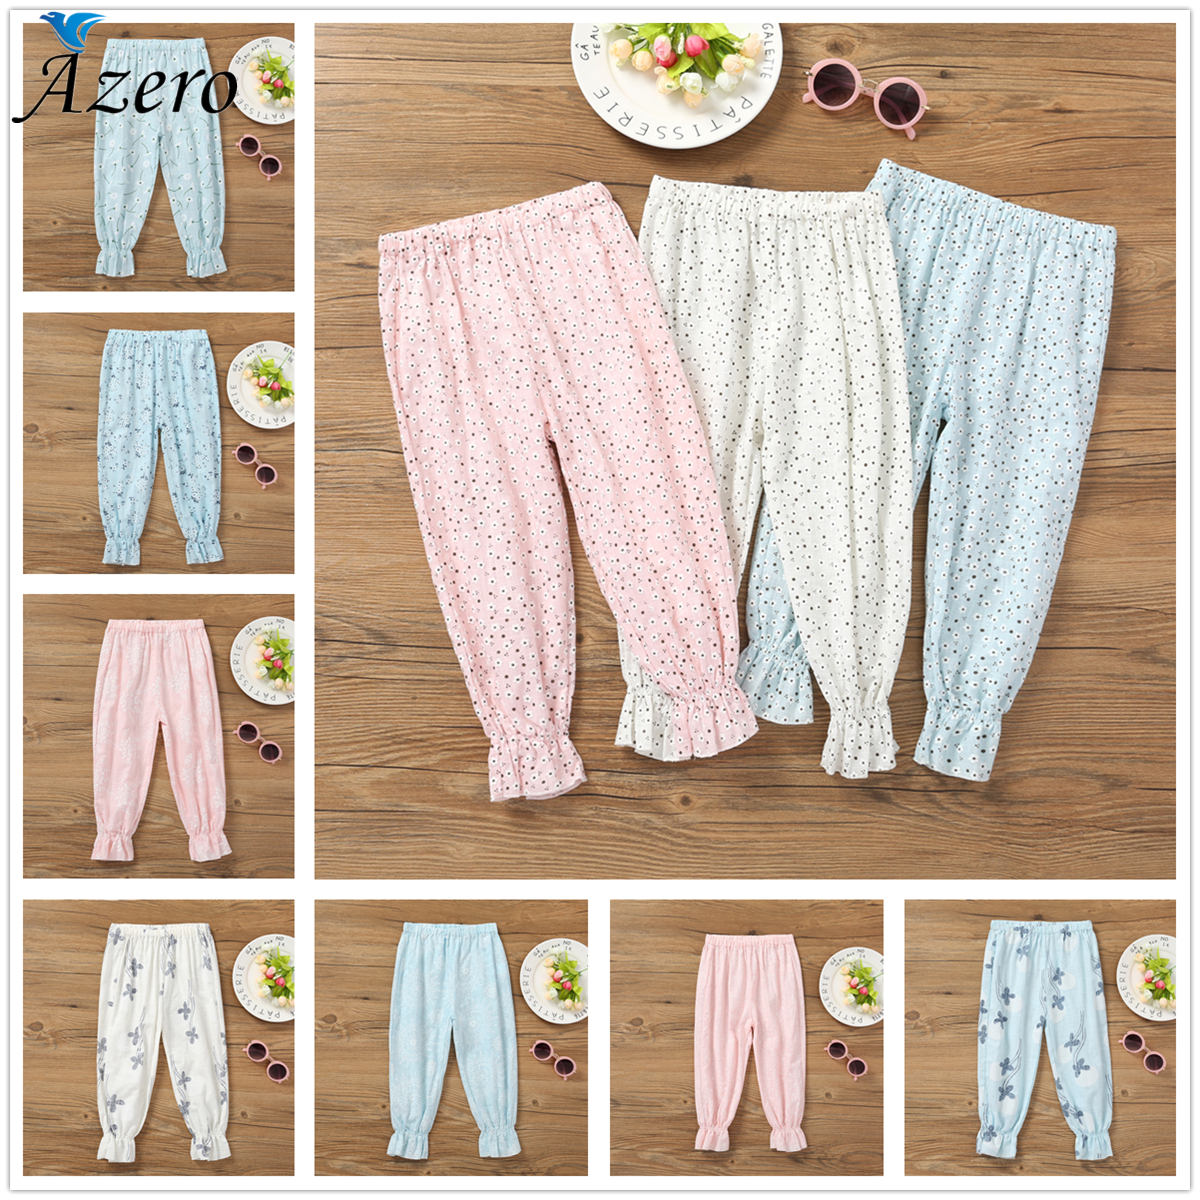 Girls Pants Trousers Toddlers Summer Long Bottoms Fashion Pants Children Harem